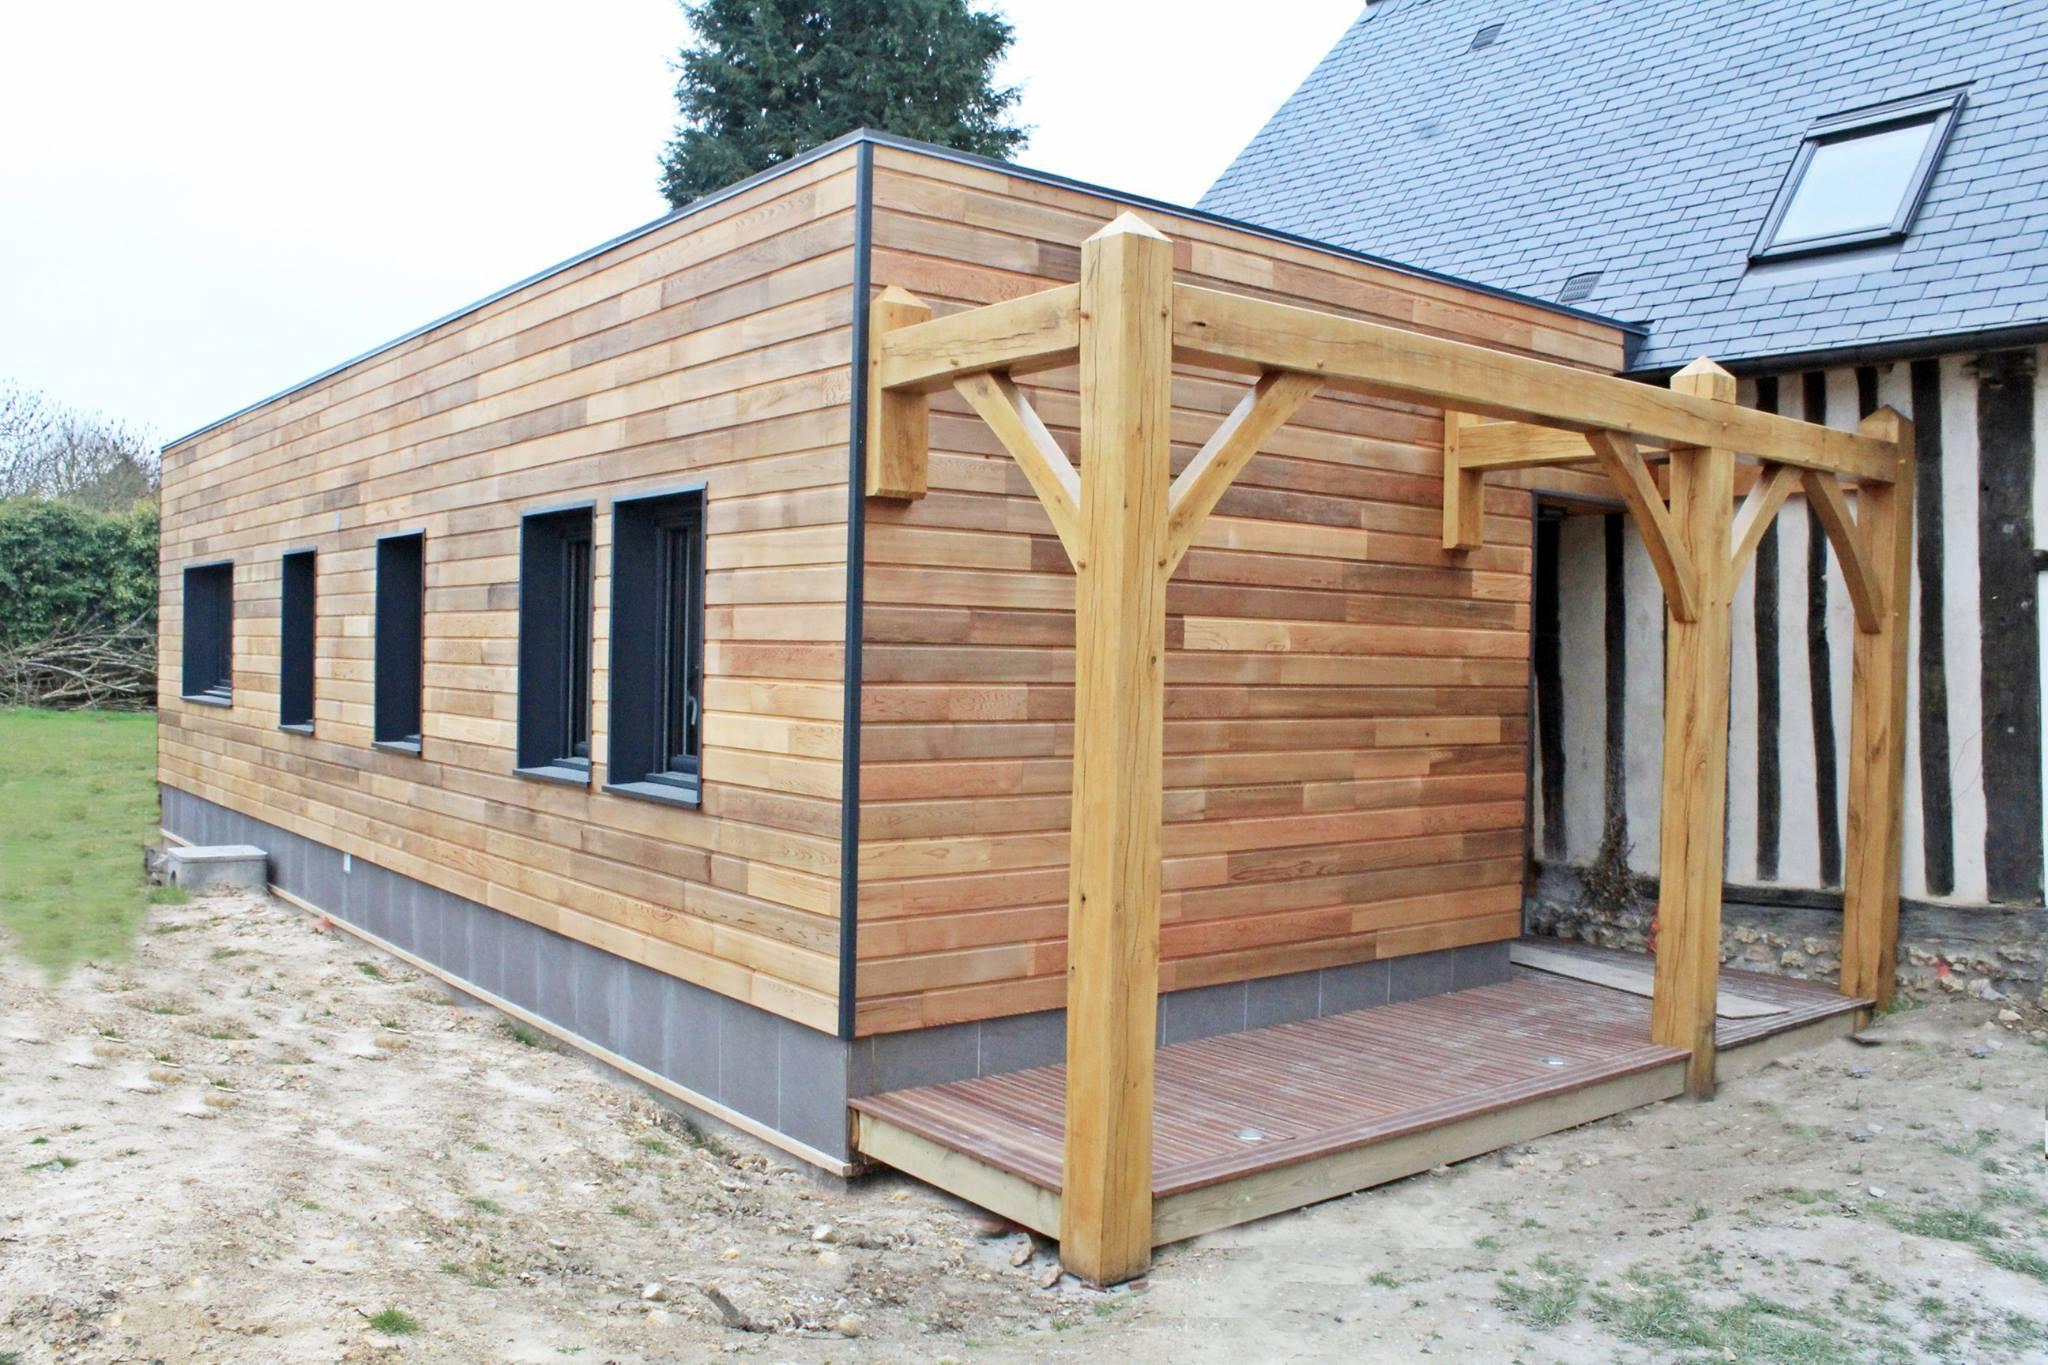 ossature bois alliance bois construction. Black Bedroom Furniture Sets. Home Design Ideas